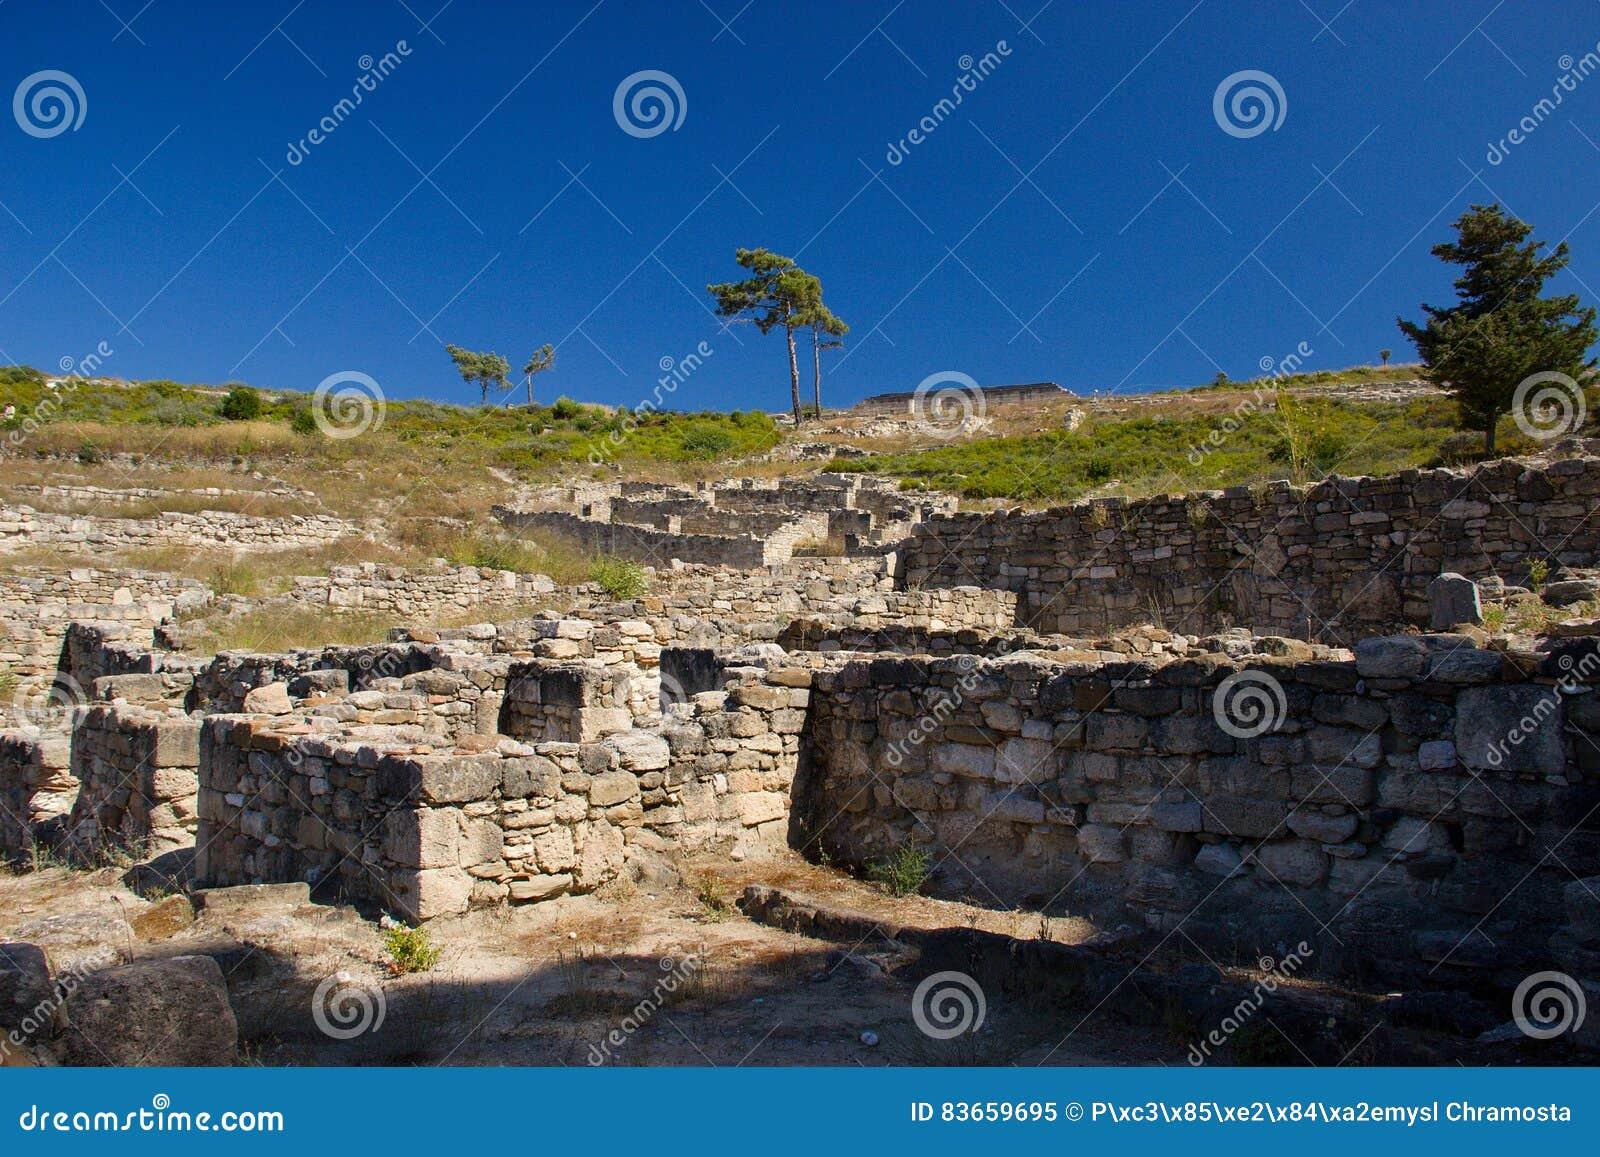 Ancient Kamiros Rhodos Greece architecture historic